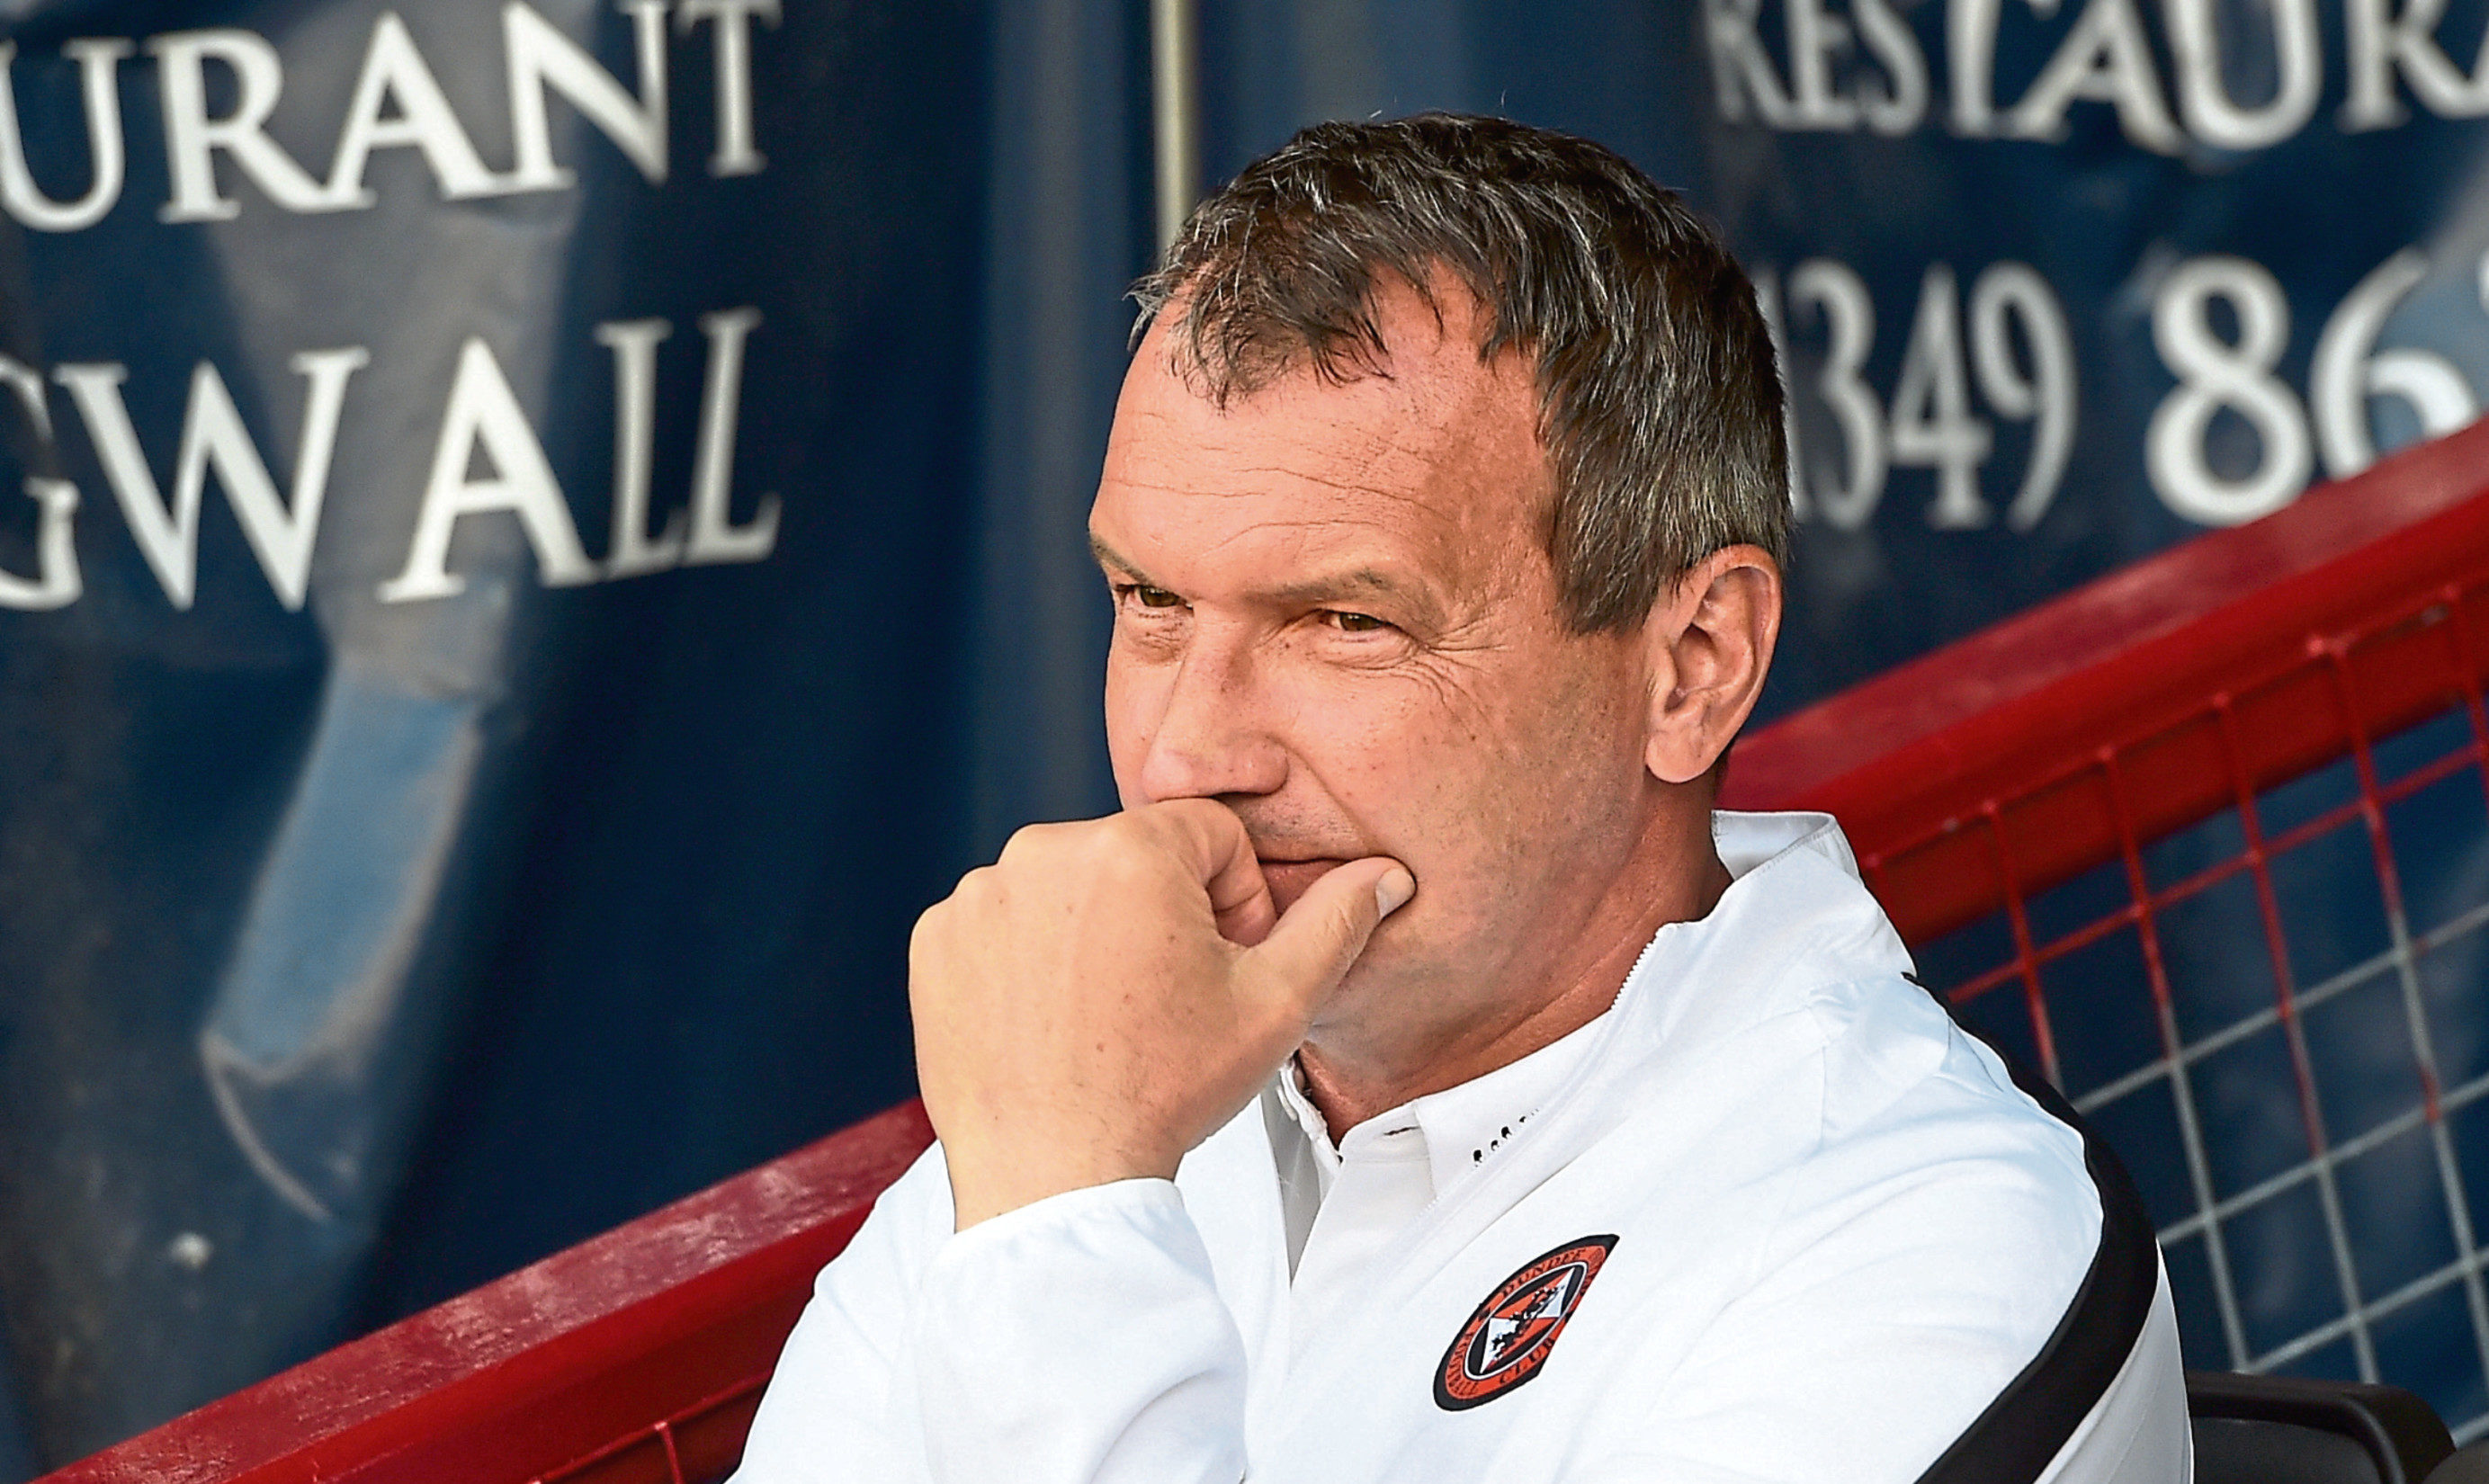 Former Dundee United manager Csaba Laszlo